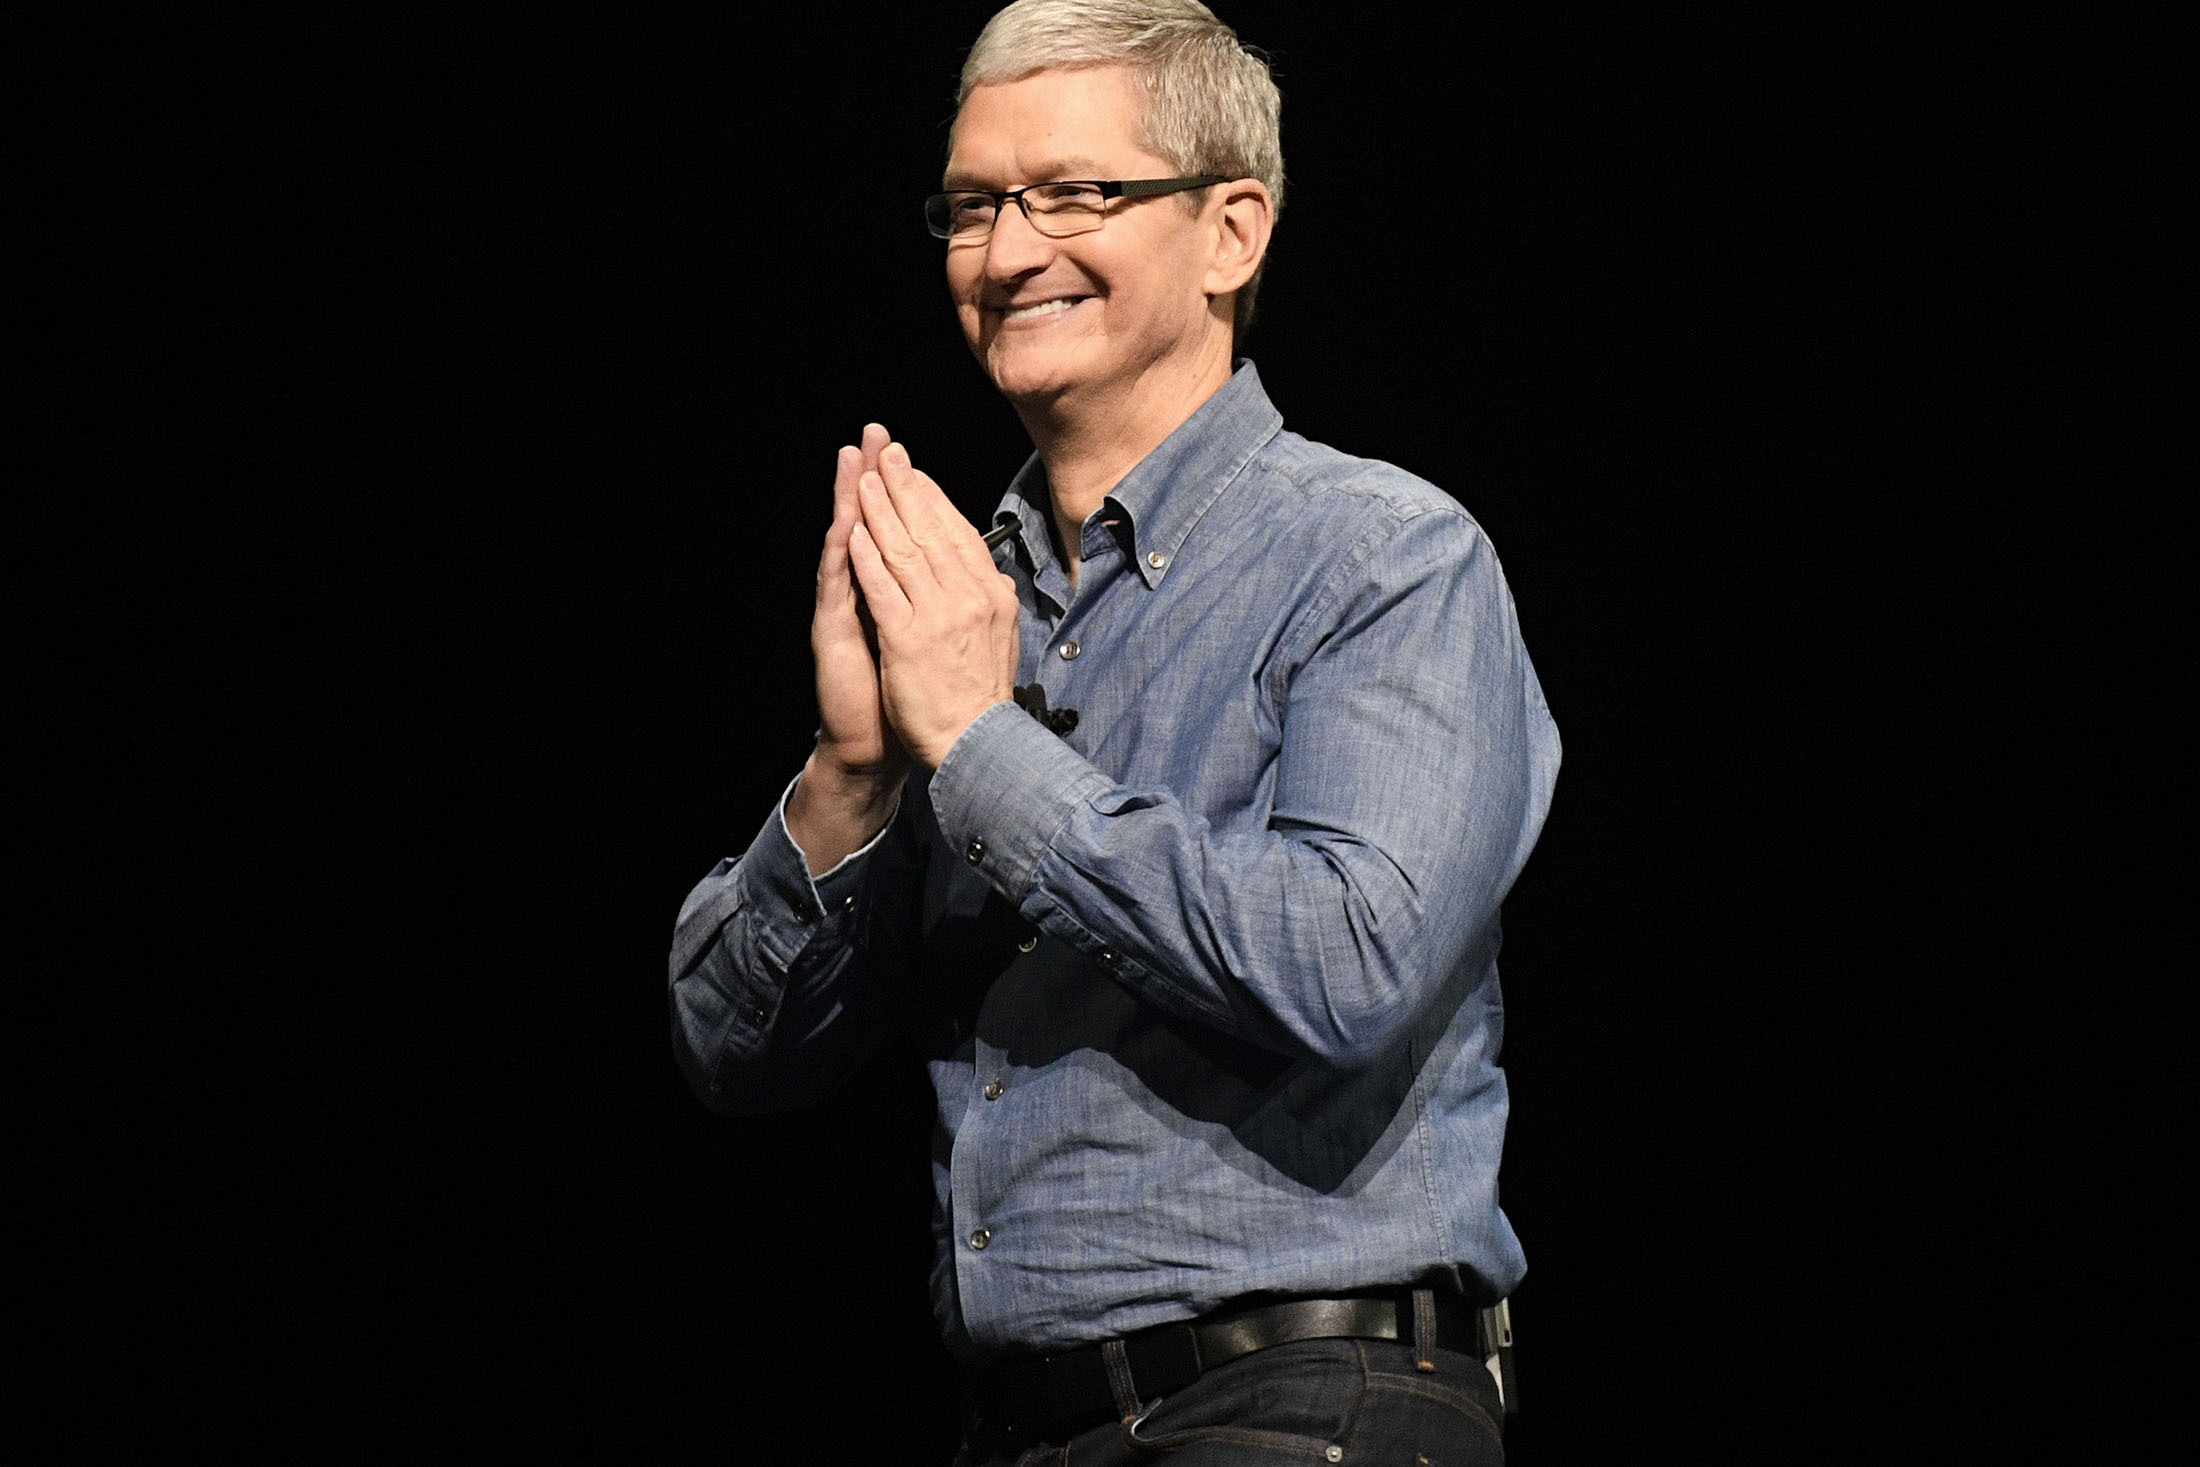 <b>苹果希望透过降价扭转中国市场颓势,但这样行吗?</b>